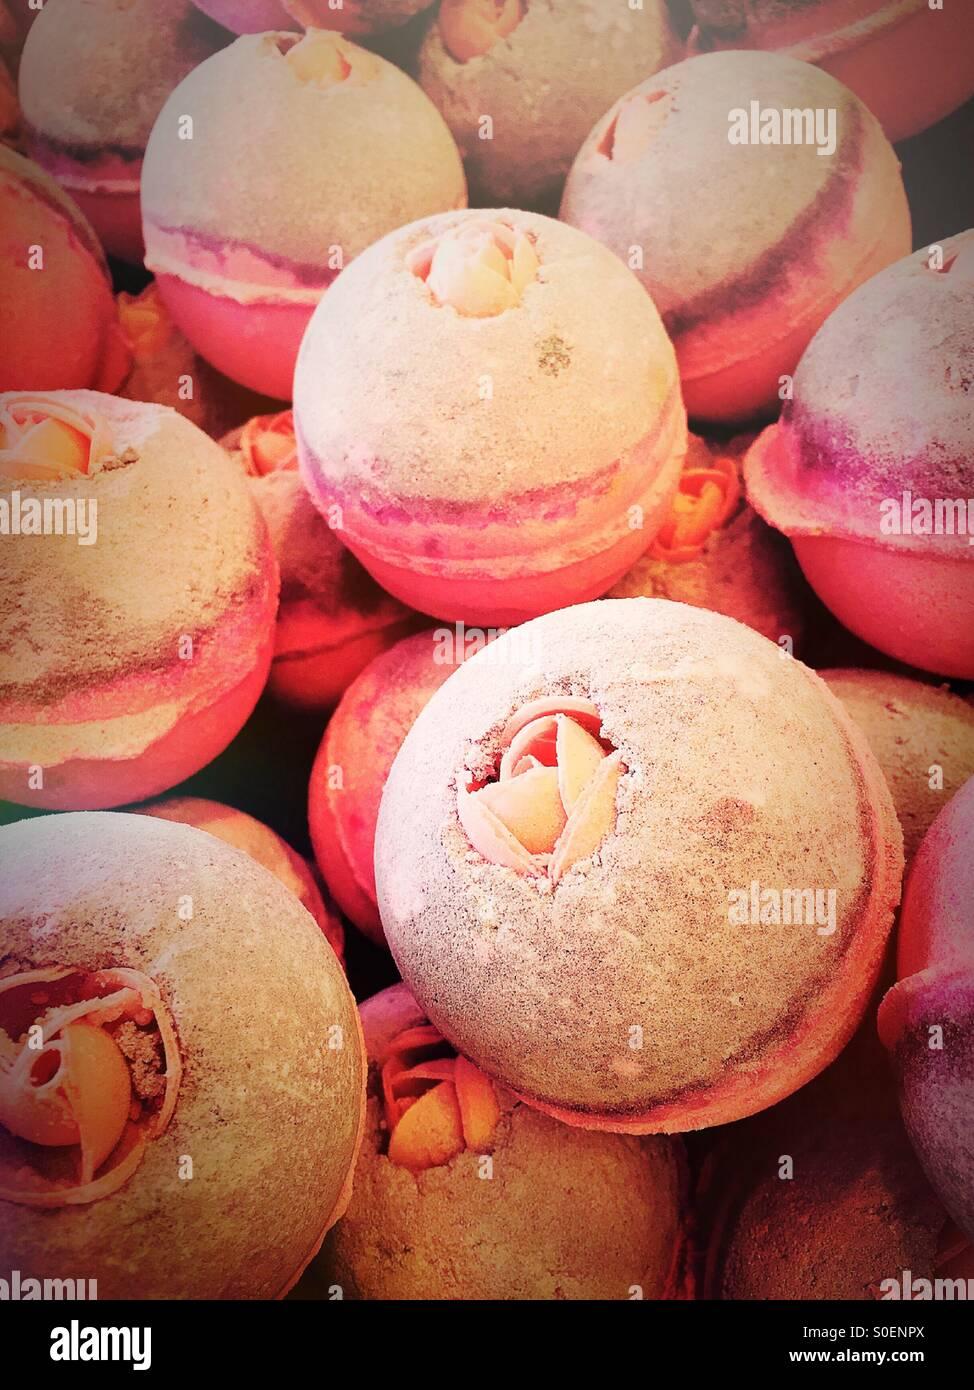 Bubble bath bomb at Lush Cosmetics - Stock Image